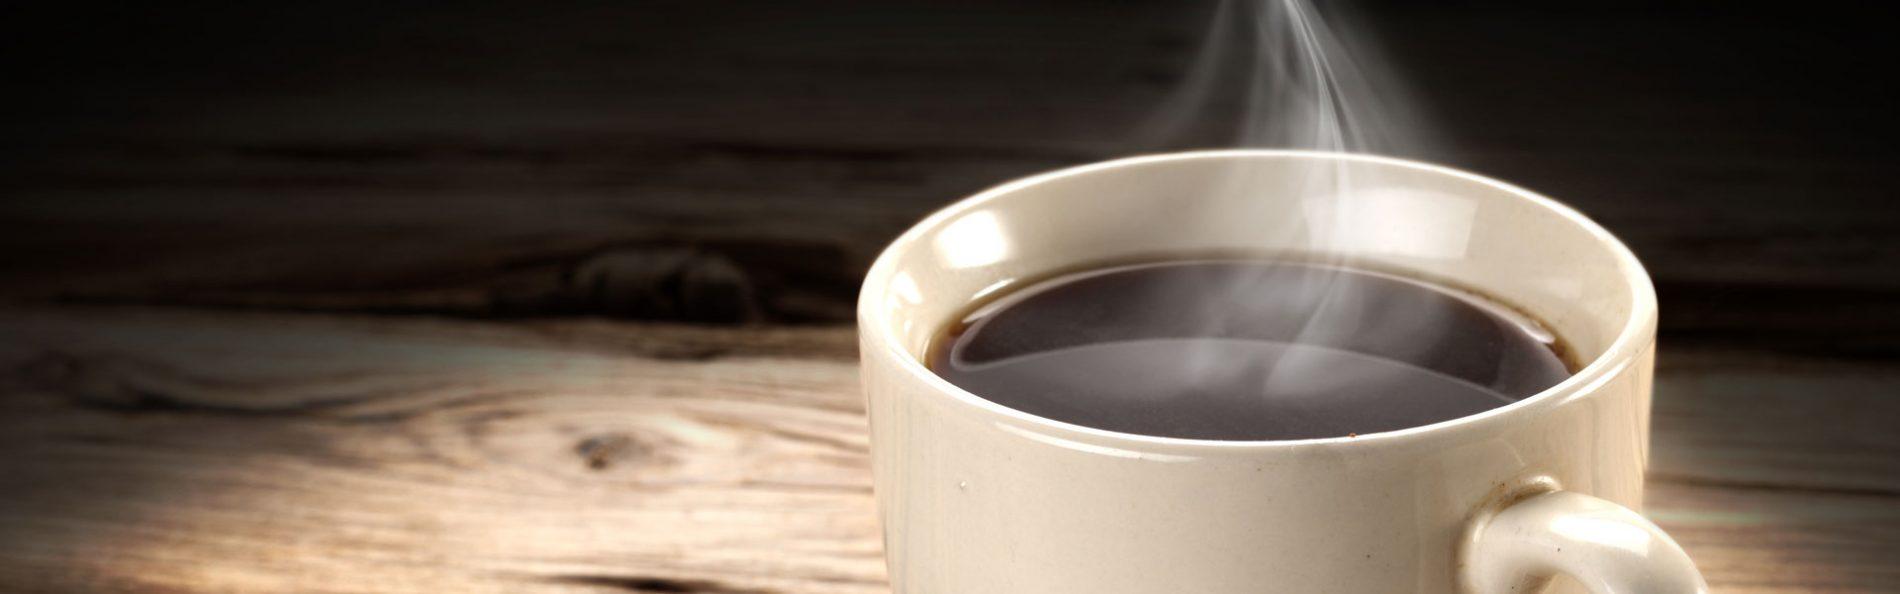 TEC COFFEE & FOODS